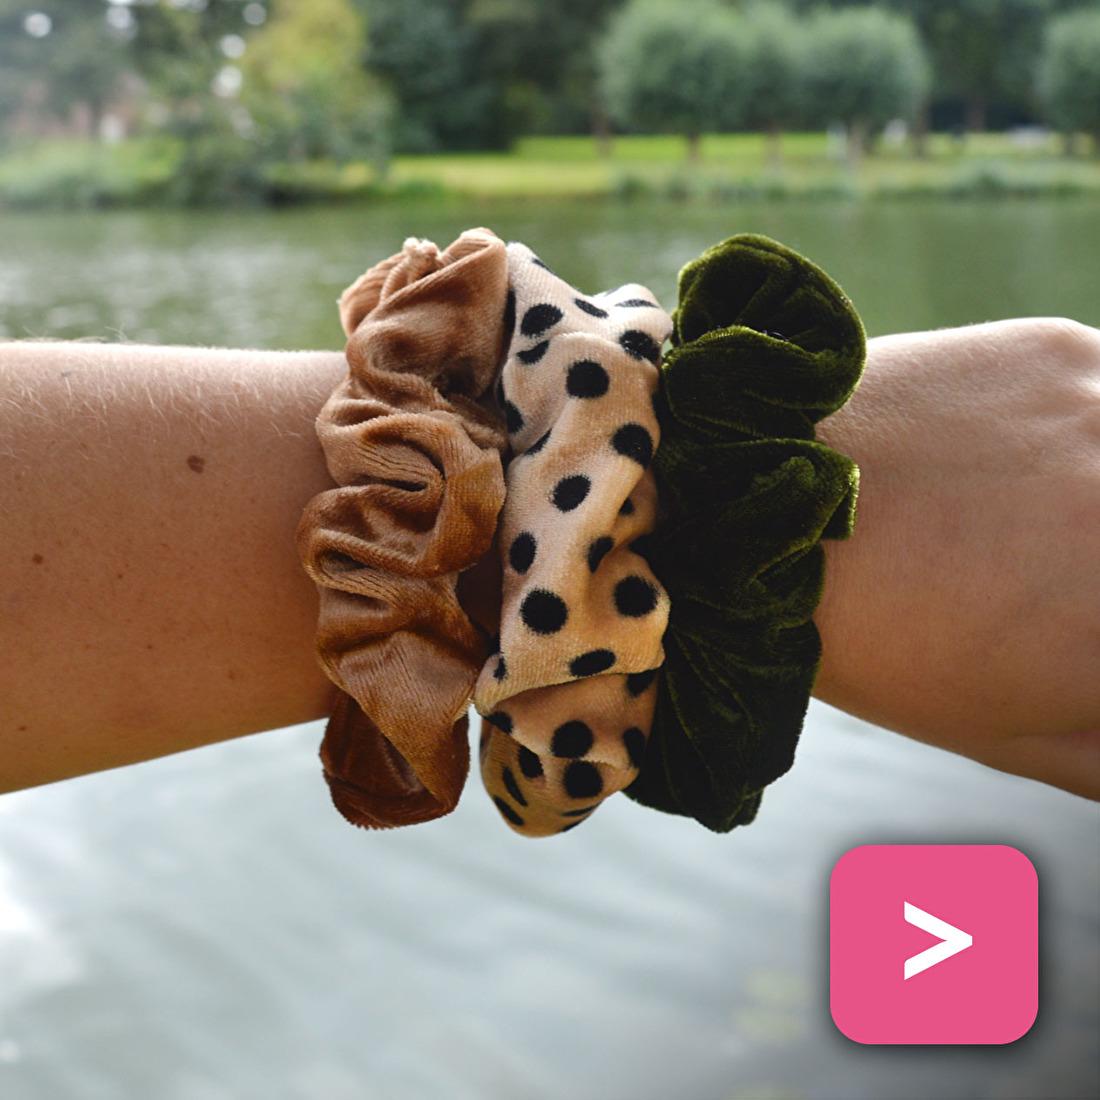 https://www.bandjesenkantjes.nl/c-4712263/scrunchies/